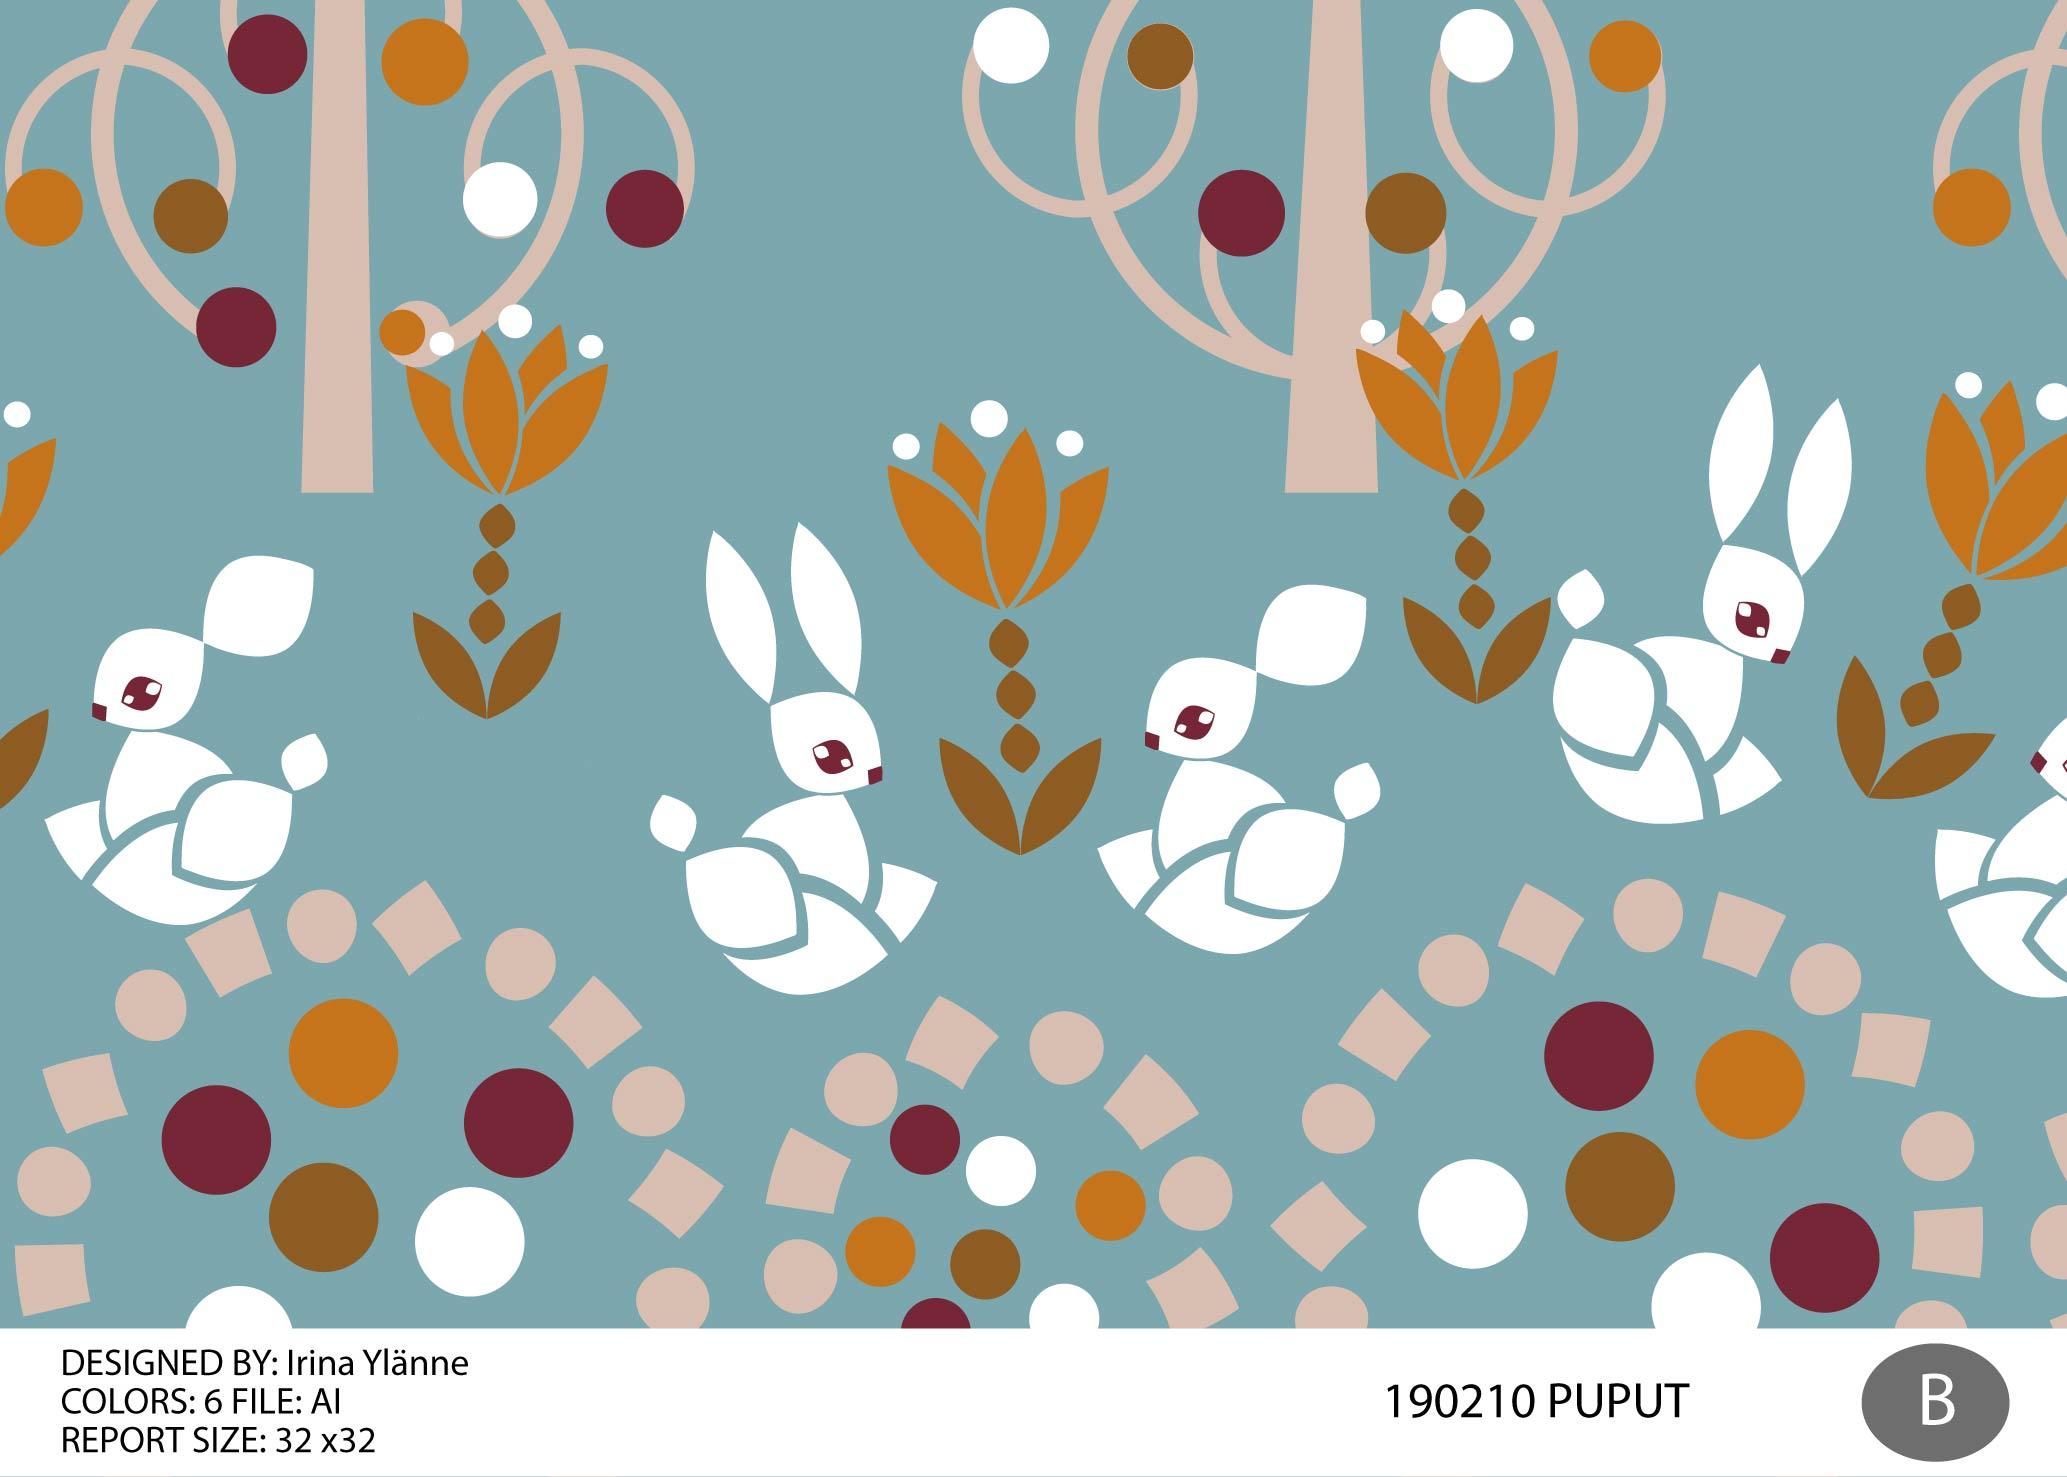 irinas_190210_puput-01